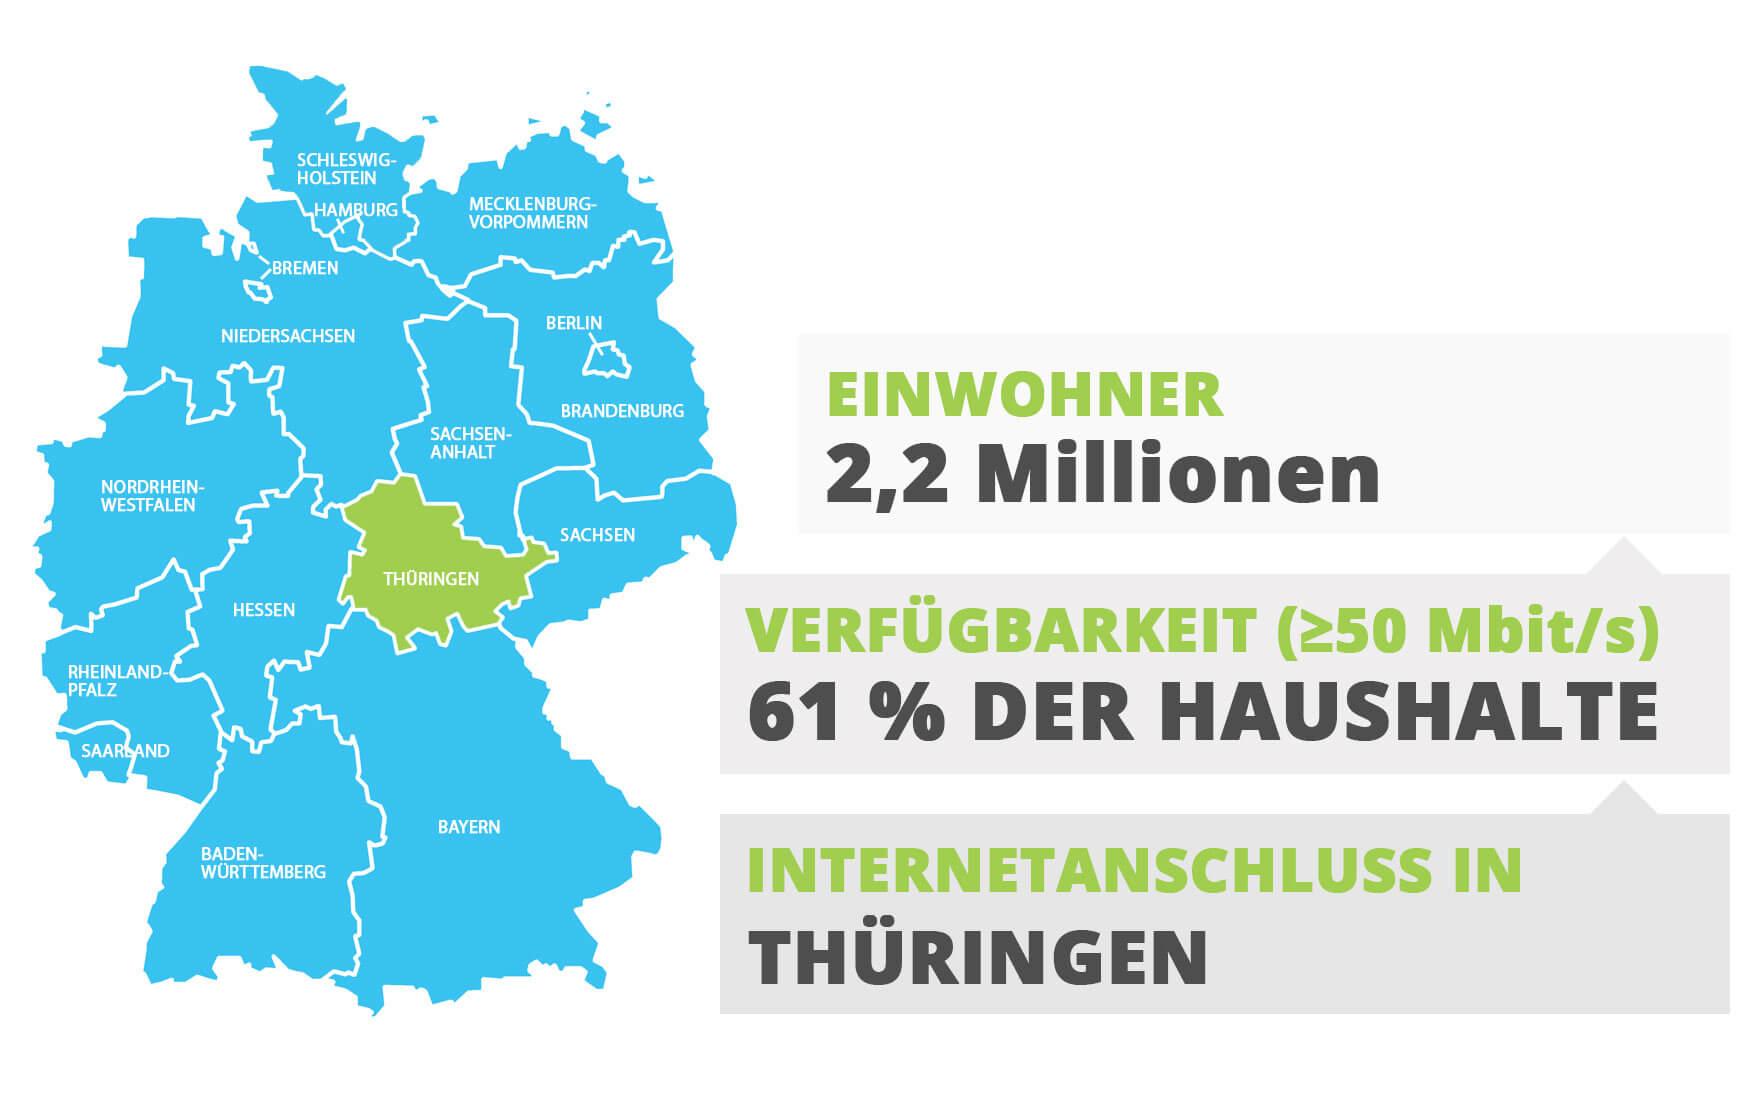 Internetanschluss in Thüringen